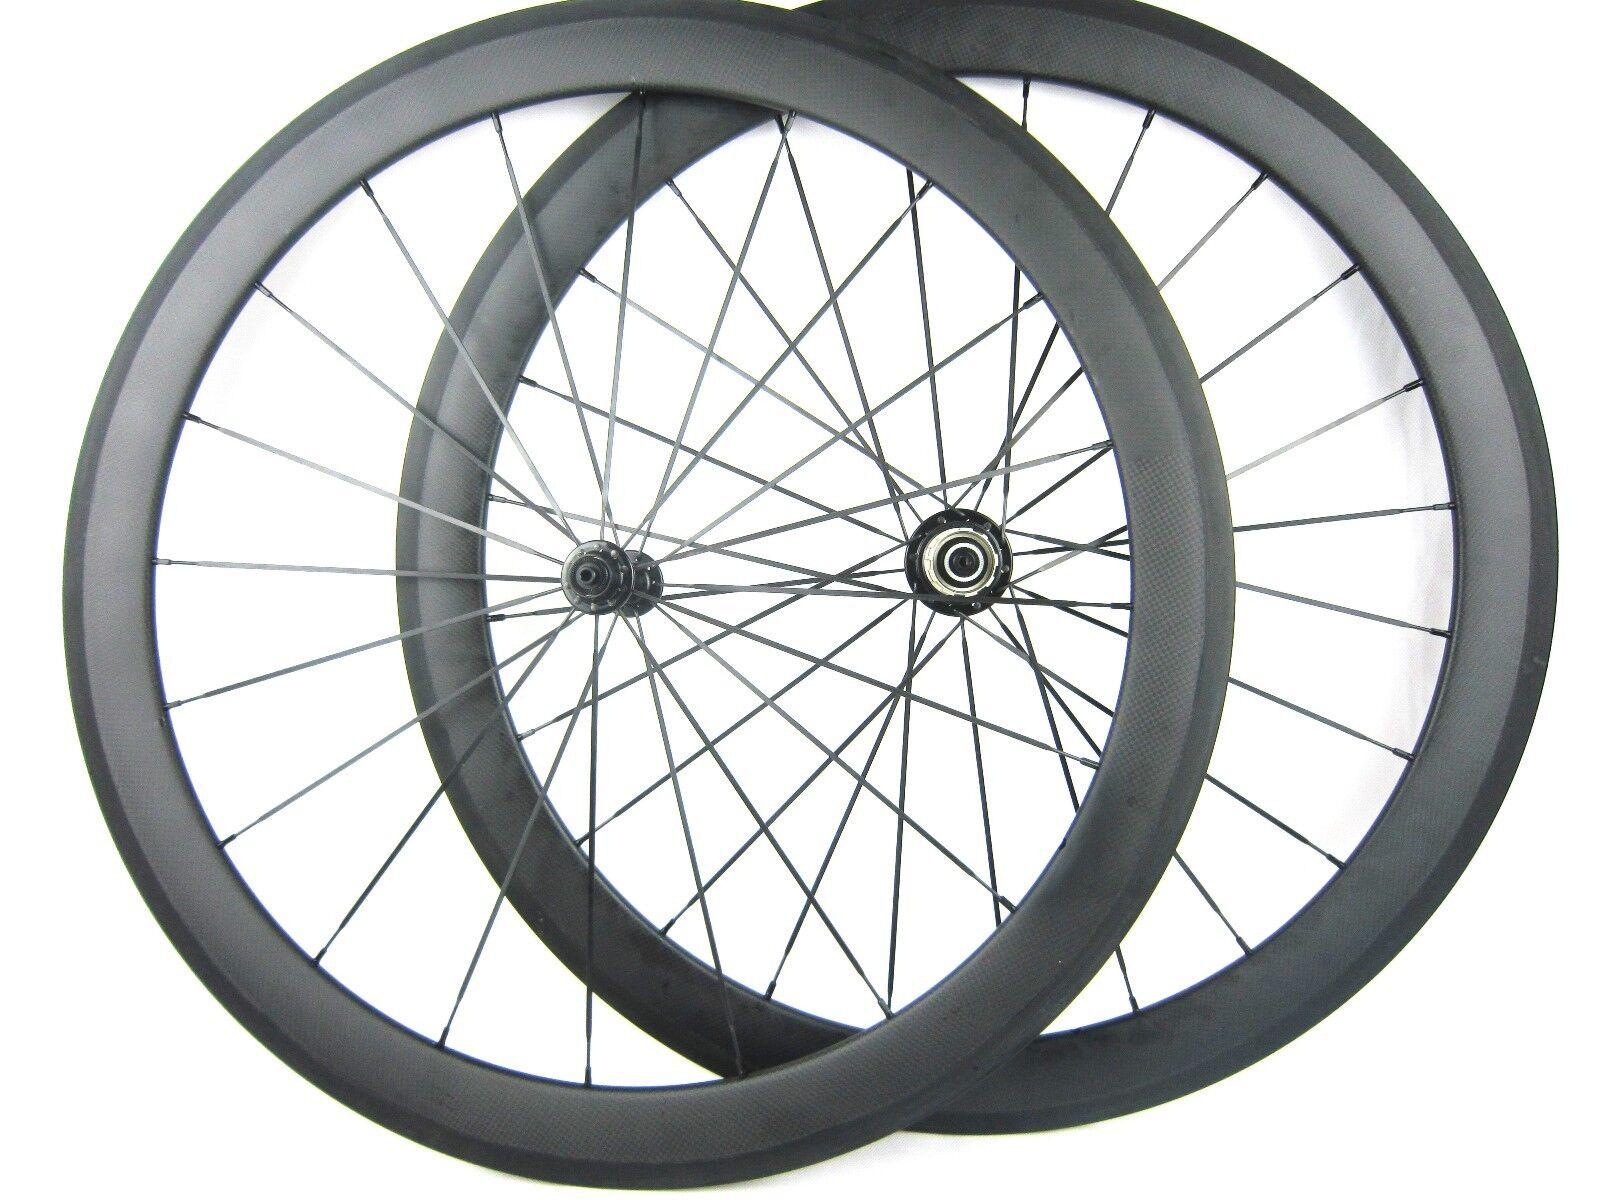 700c 50mm tubular full carbon bike wheels,carbon wheels for shimano 10 11 speed